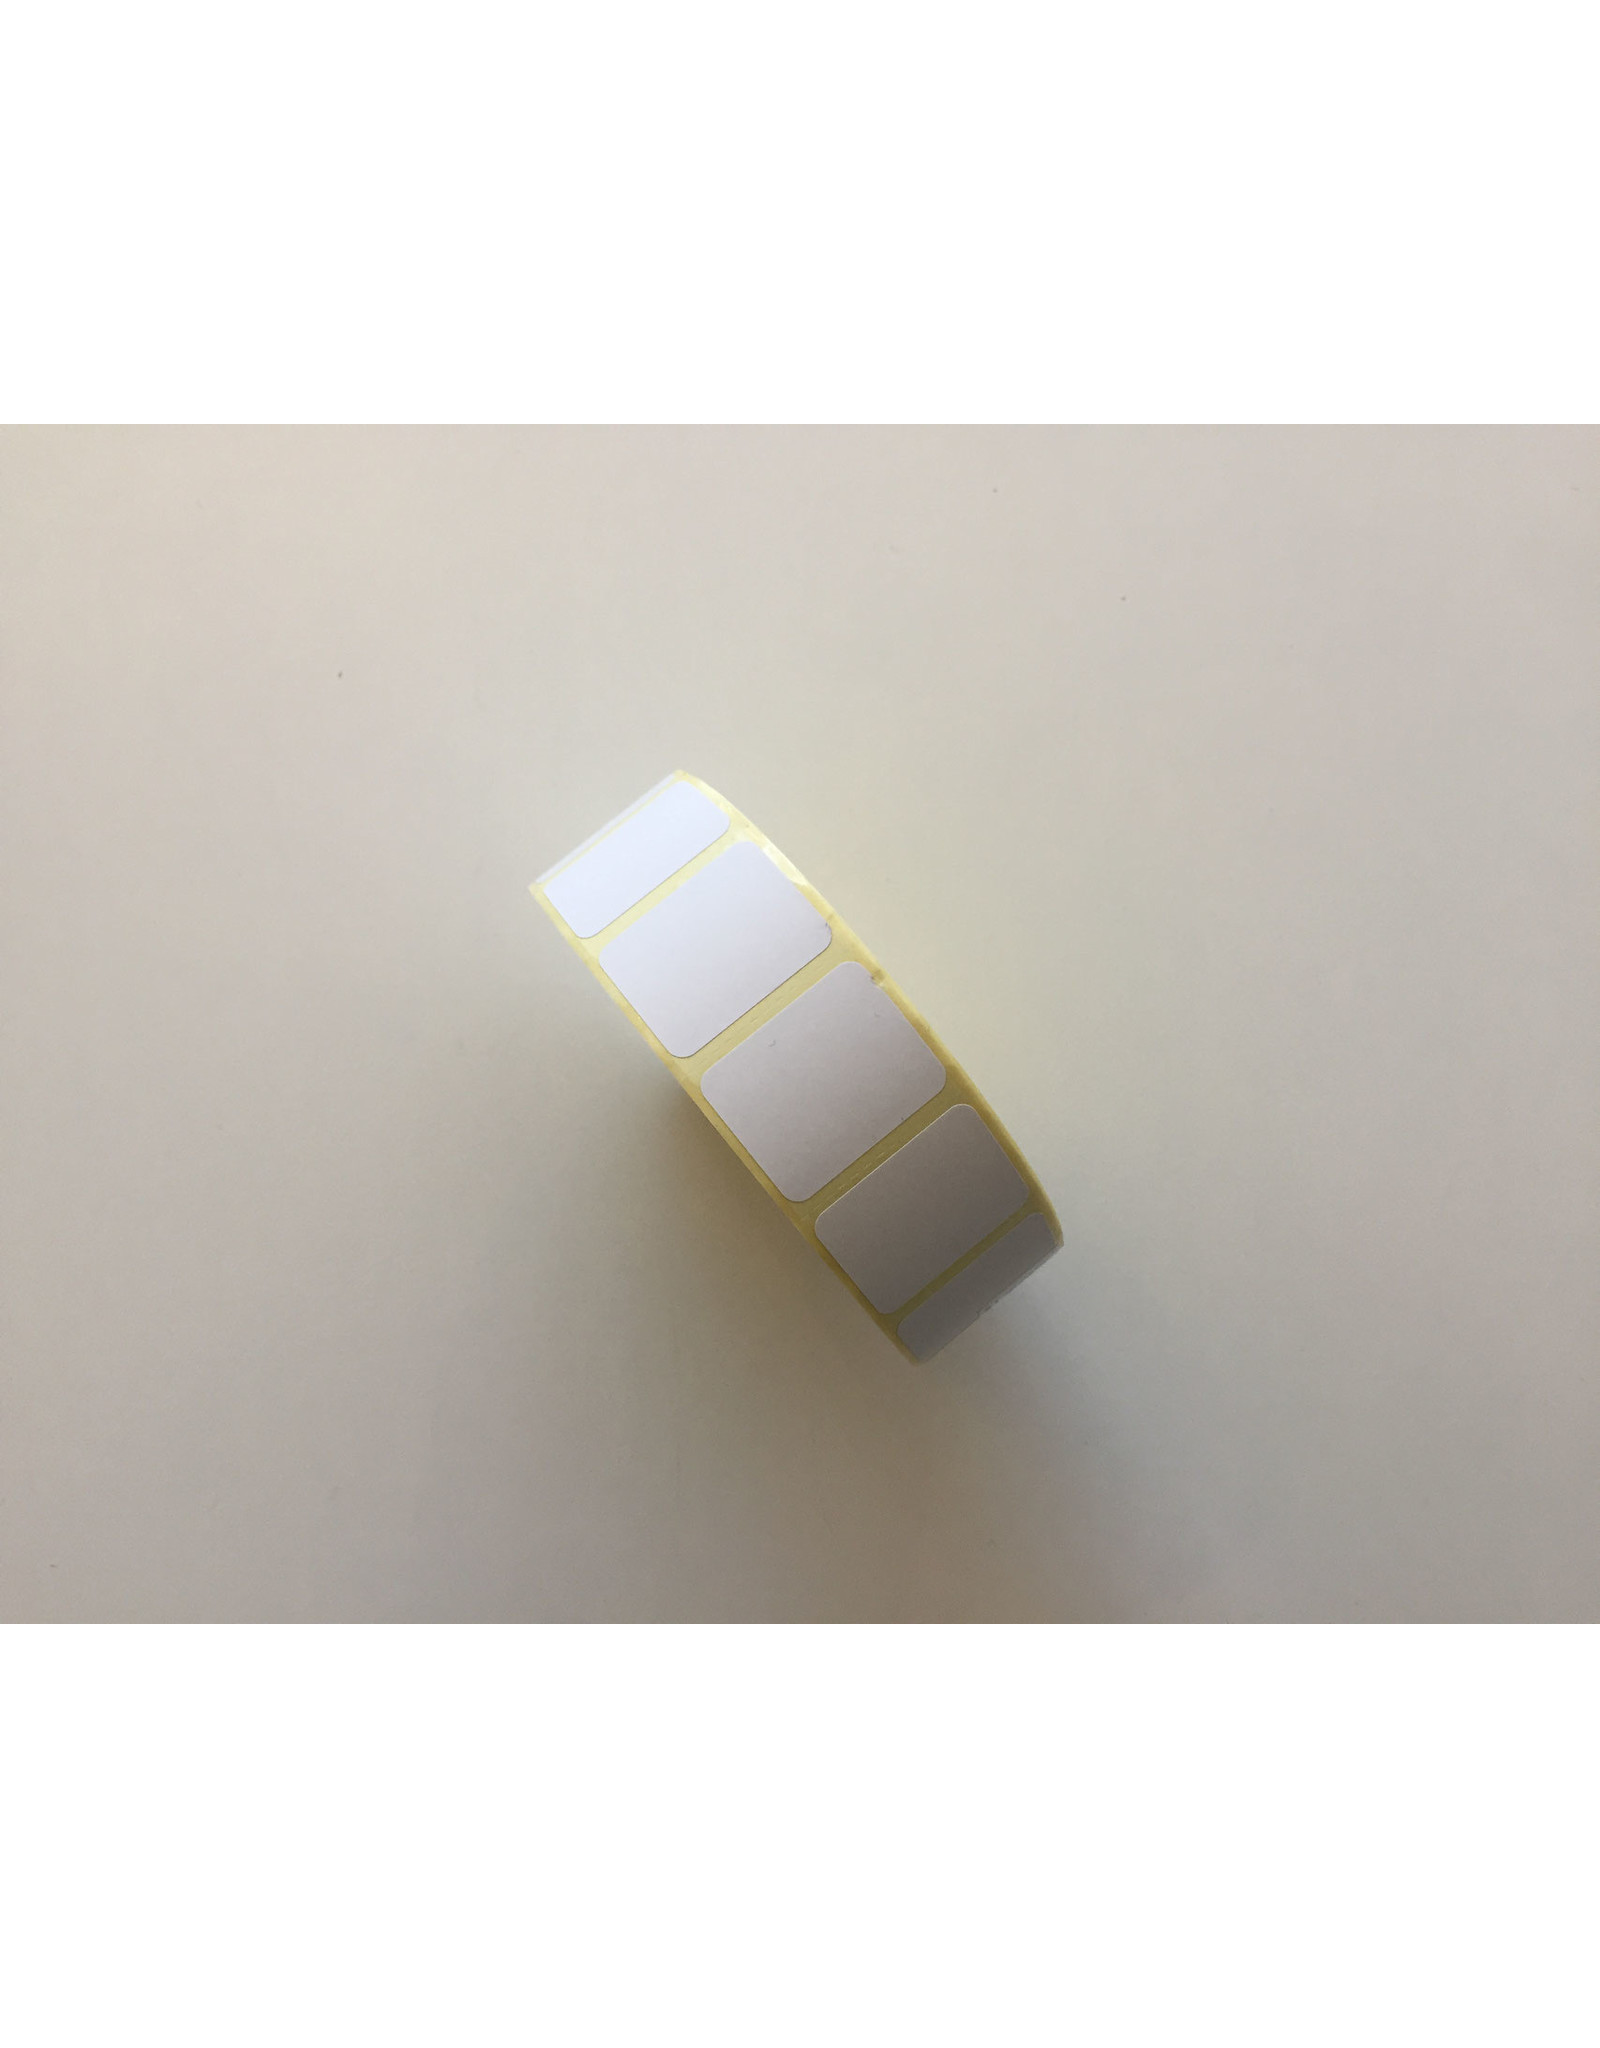 Zebra Zebra Thermal Label 1,25 x 1,00 (32x25) - PERMANENT - 2580 labels - 12 rollen